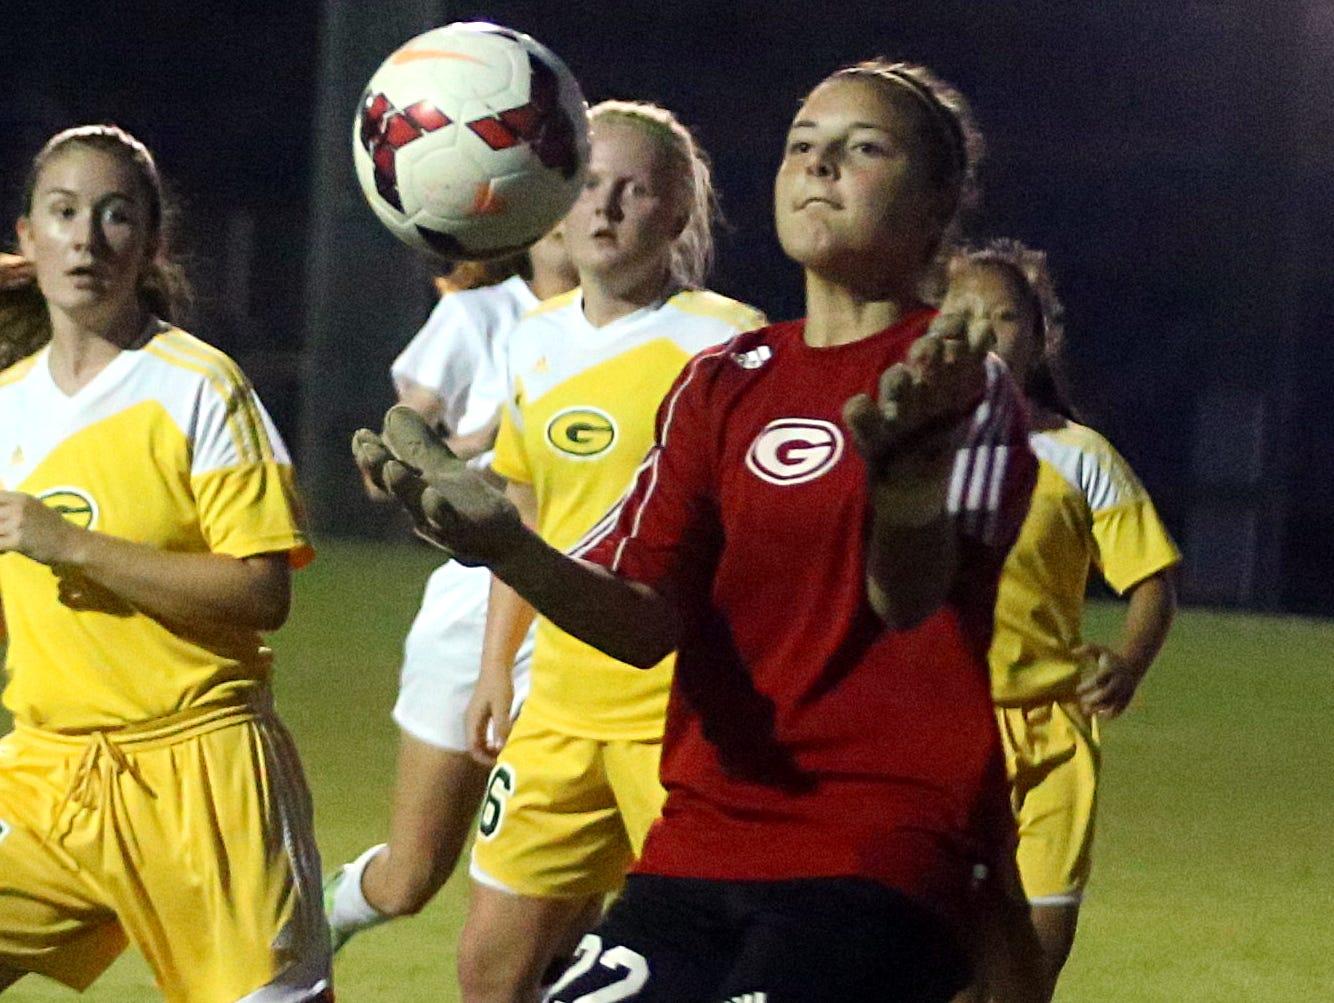 Gallatin goalkeeper Abi Green returns for her junior season after garnering first-team All-County honors last season.